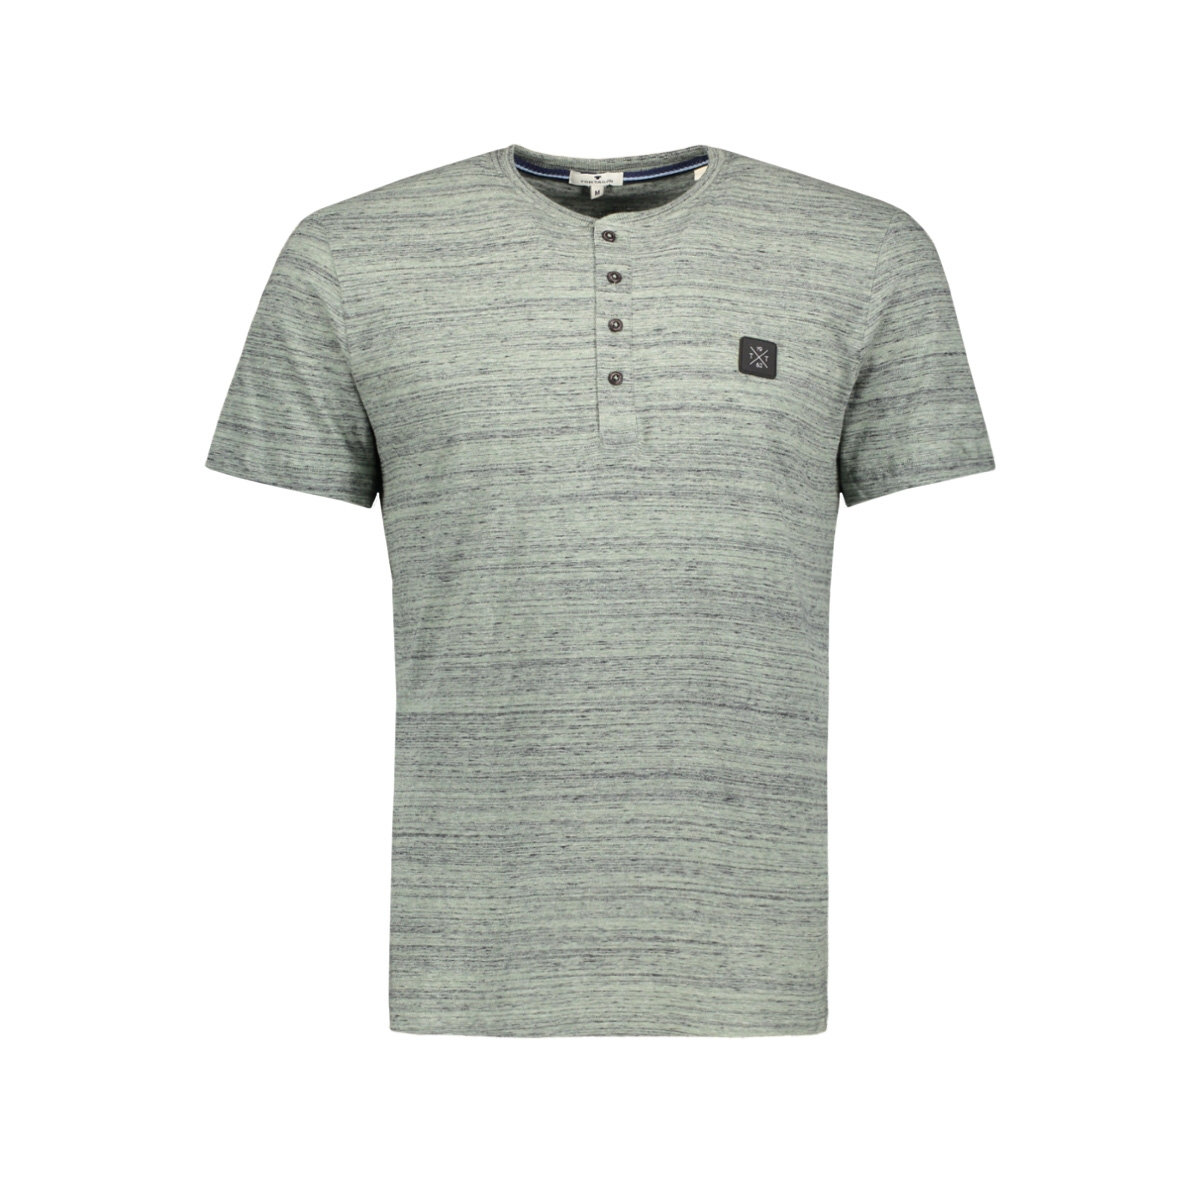 1008959xx10 tom tailor t-shirt 16380